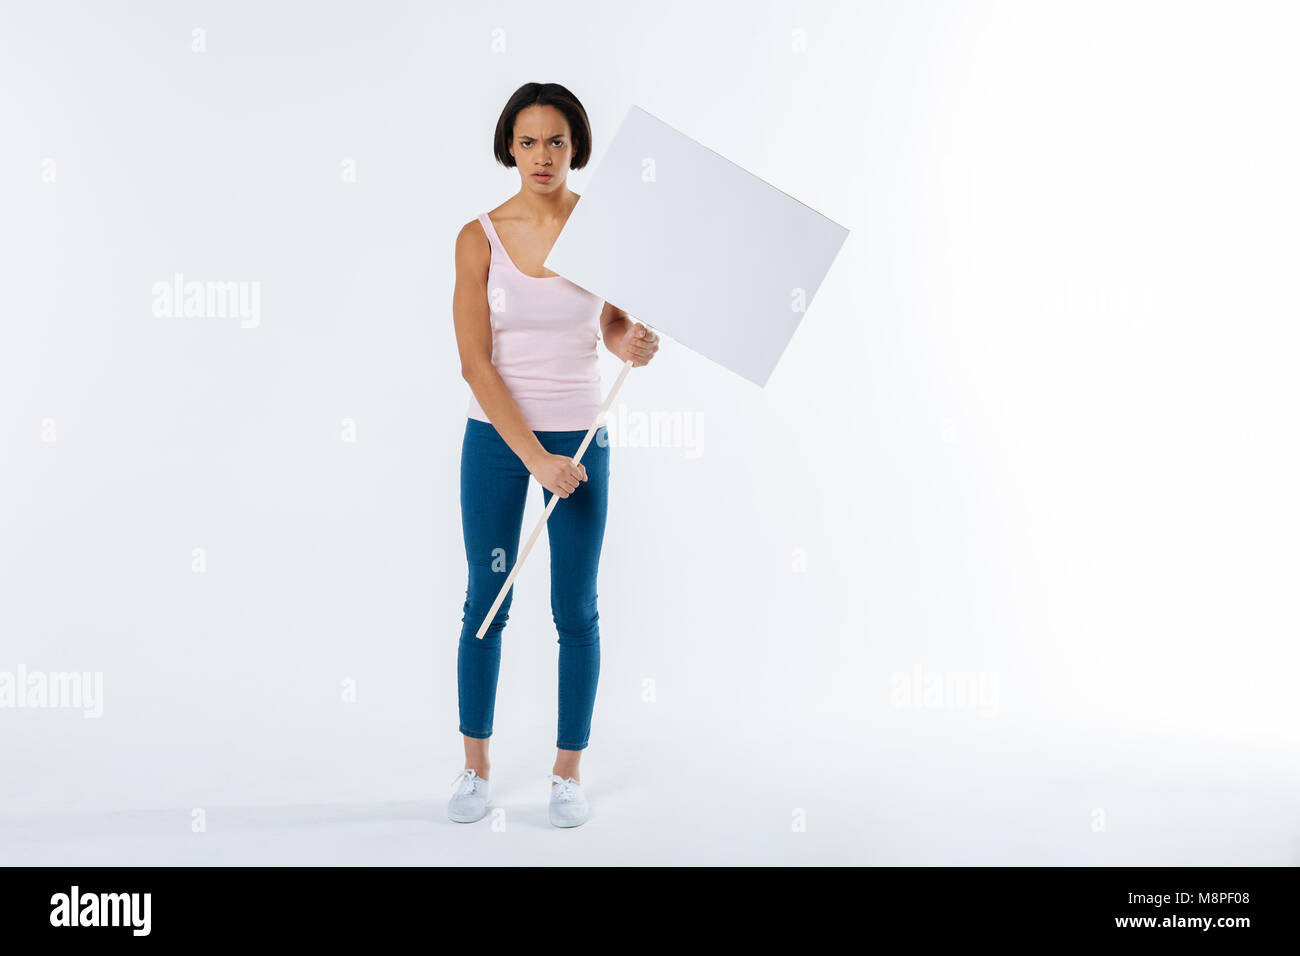 Cheerless unhappy woman raising social awareness - Stock Image